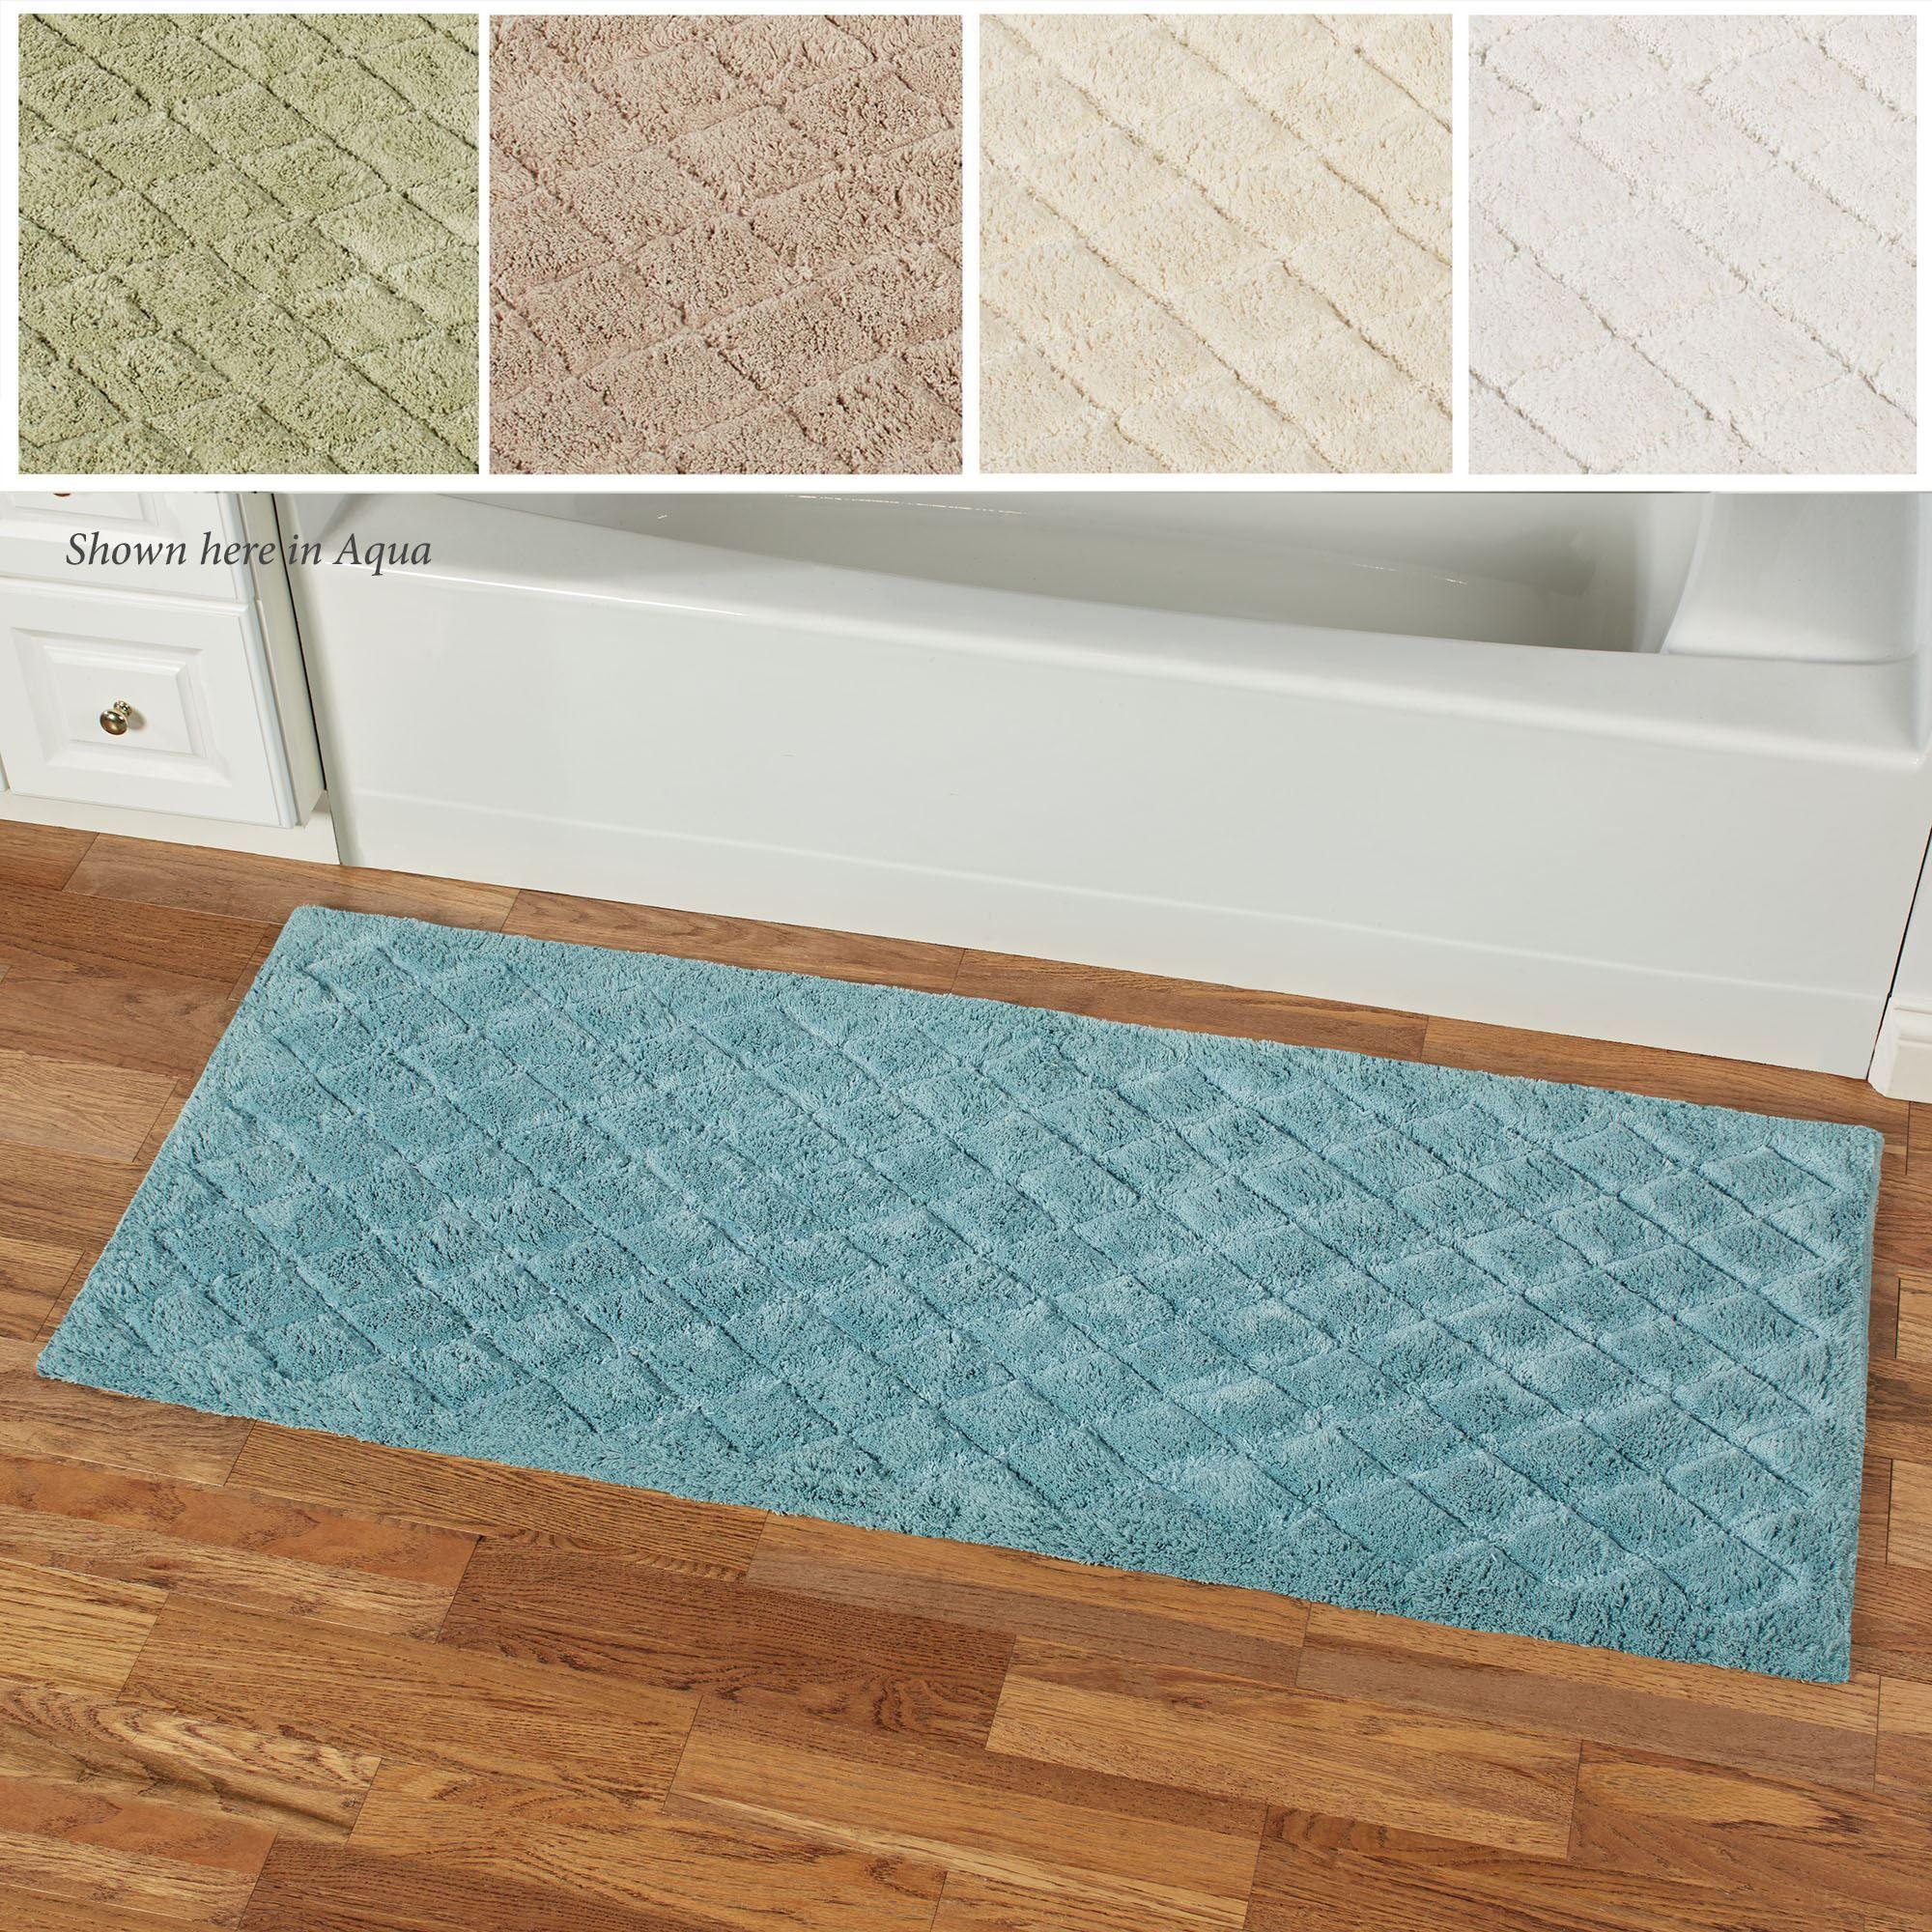 Picture of: Splendor 60 Inch Wide Plush Bath Rug Runner